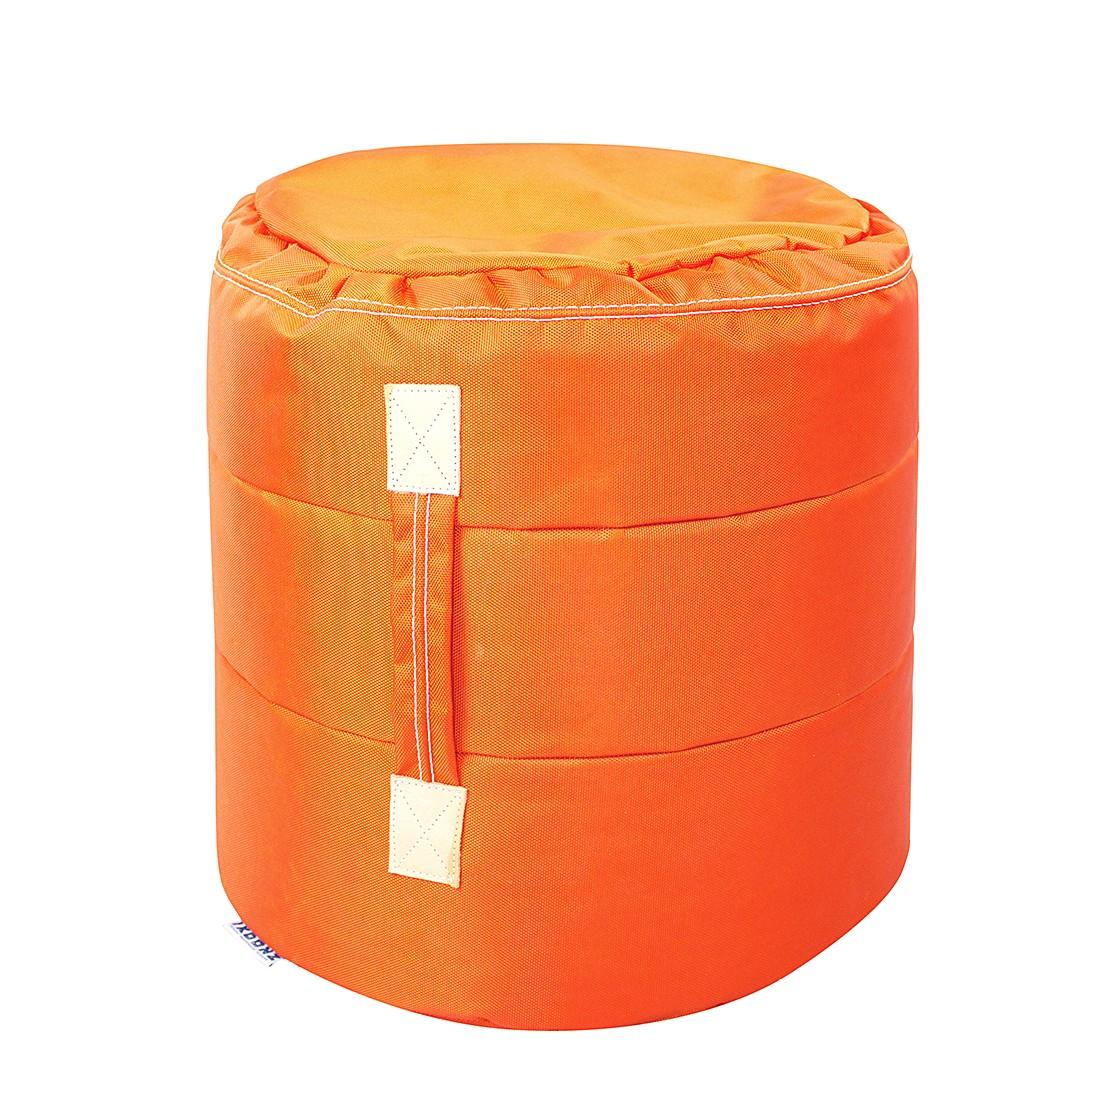 Hocker Tub – Orange, Ikoonz günstig